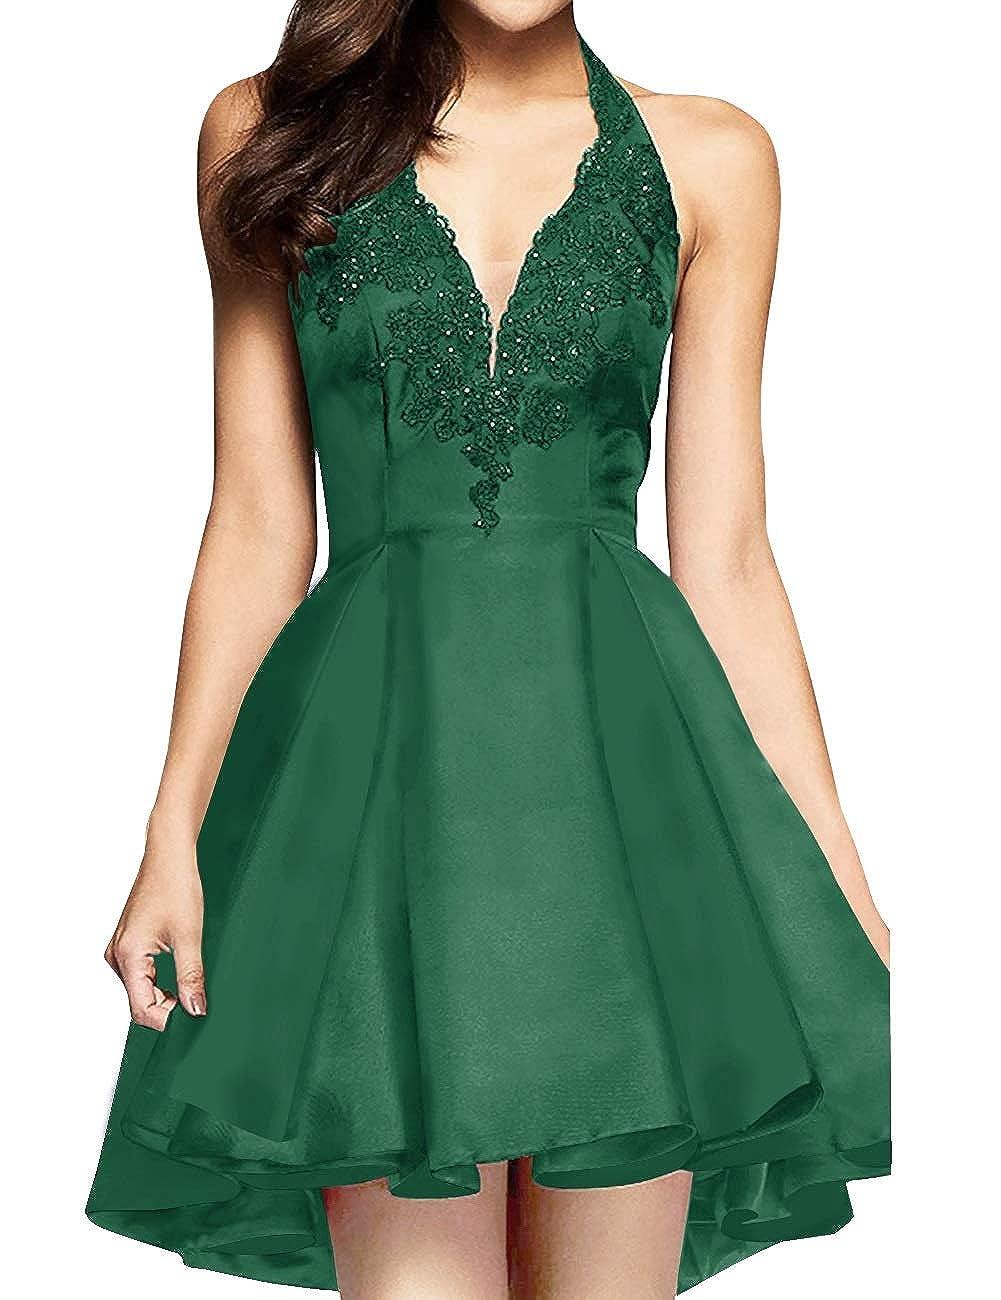 Dark Green MorySong Women's Applique Lace Satin Halter Neck Short Homecoming Cocktail Dress